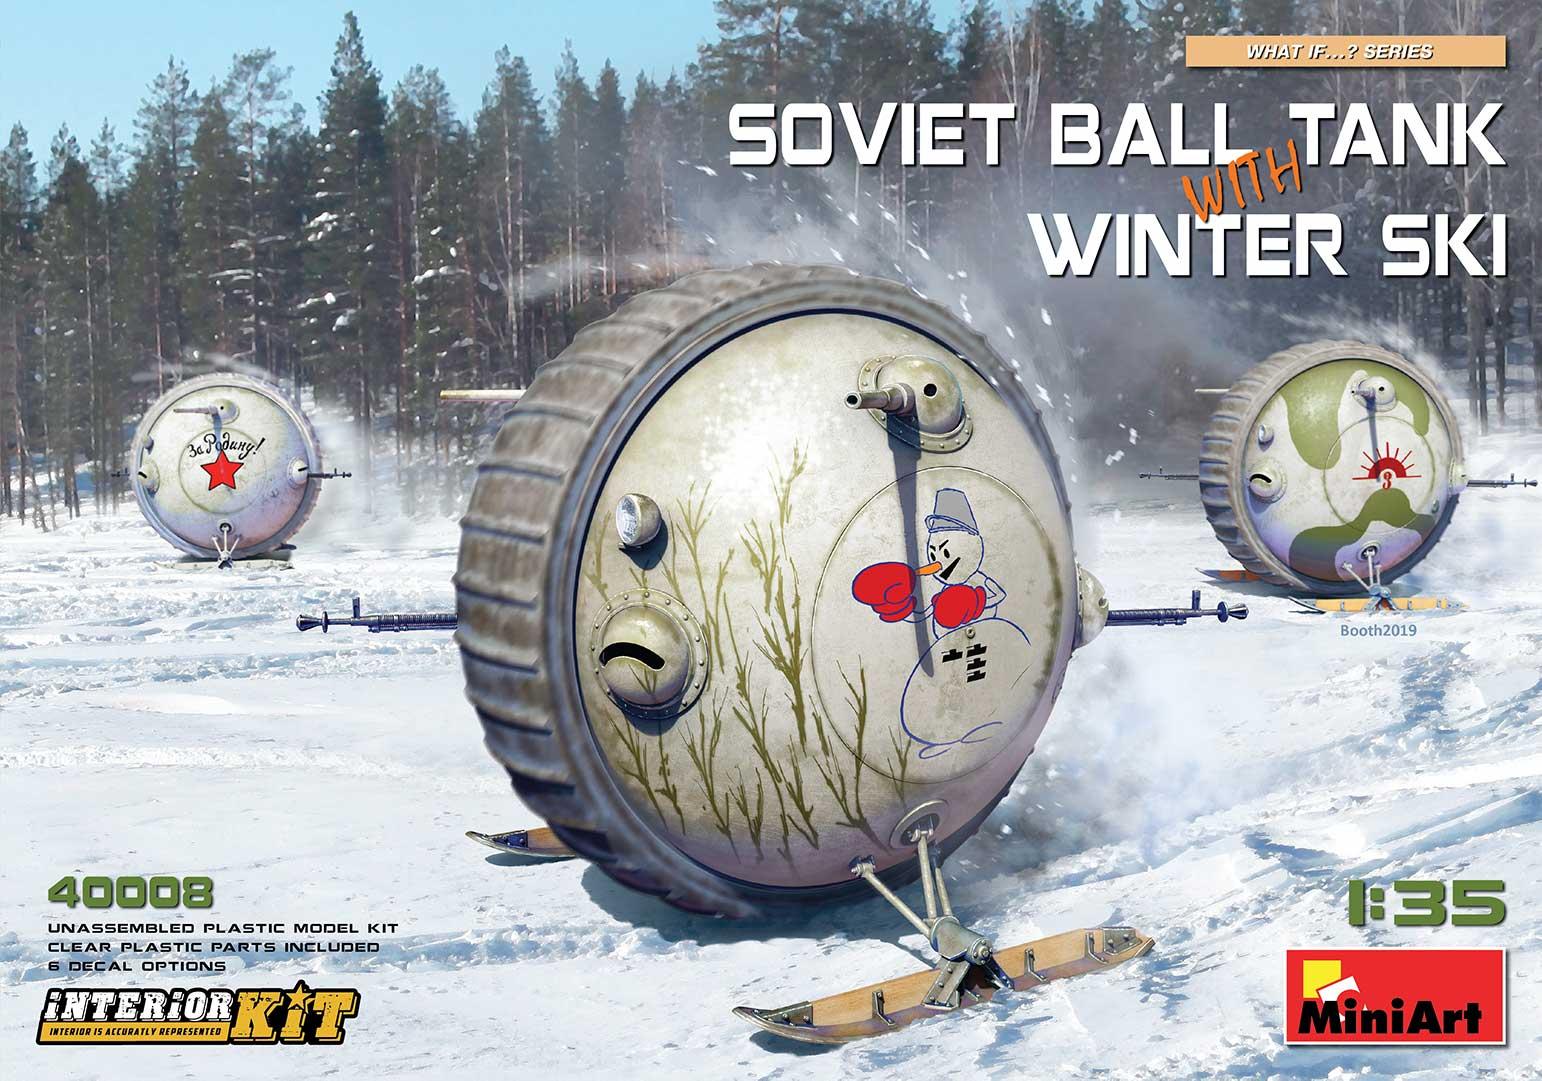 MiniArt 1/35 Soviet Ball Tank with Winter Ski. Interior Kit